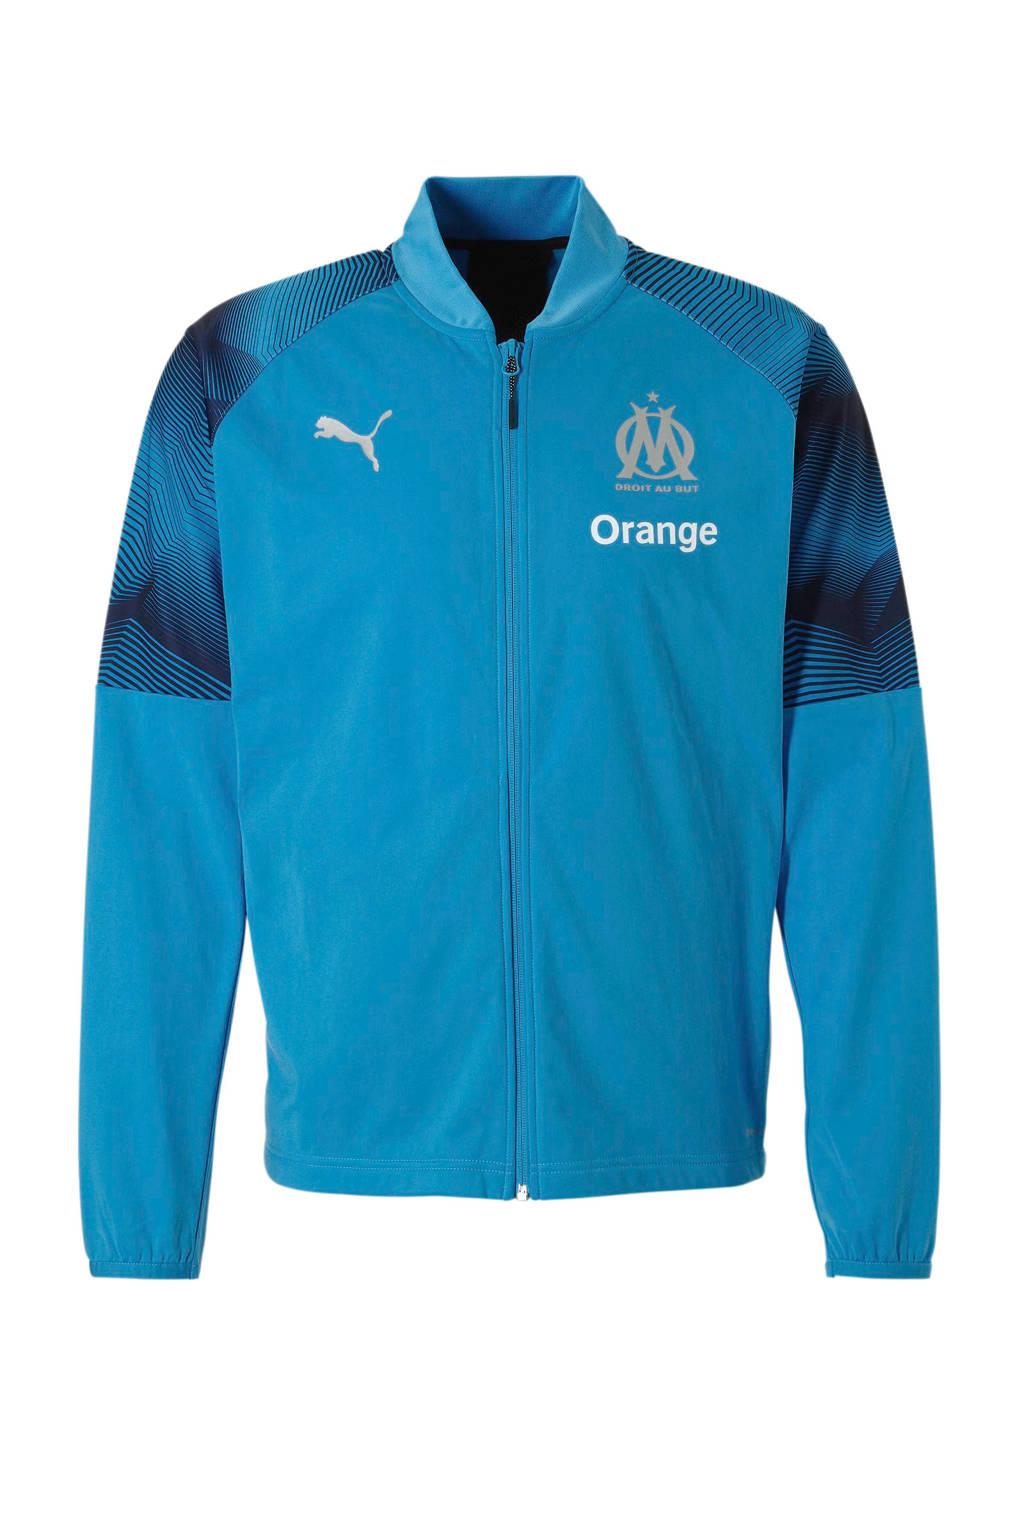 Puma Senior Olympique Lyonnais voetbaljack, Lichtblauw/marine